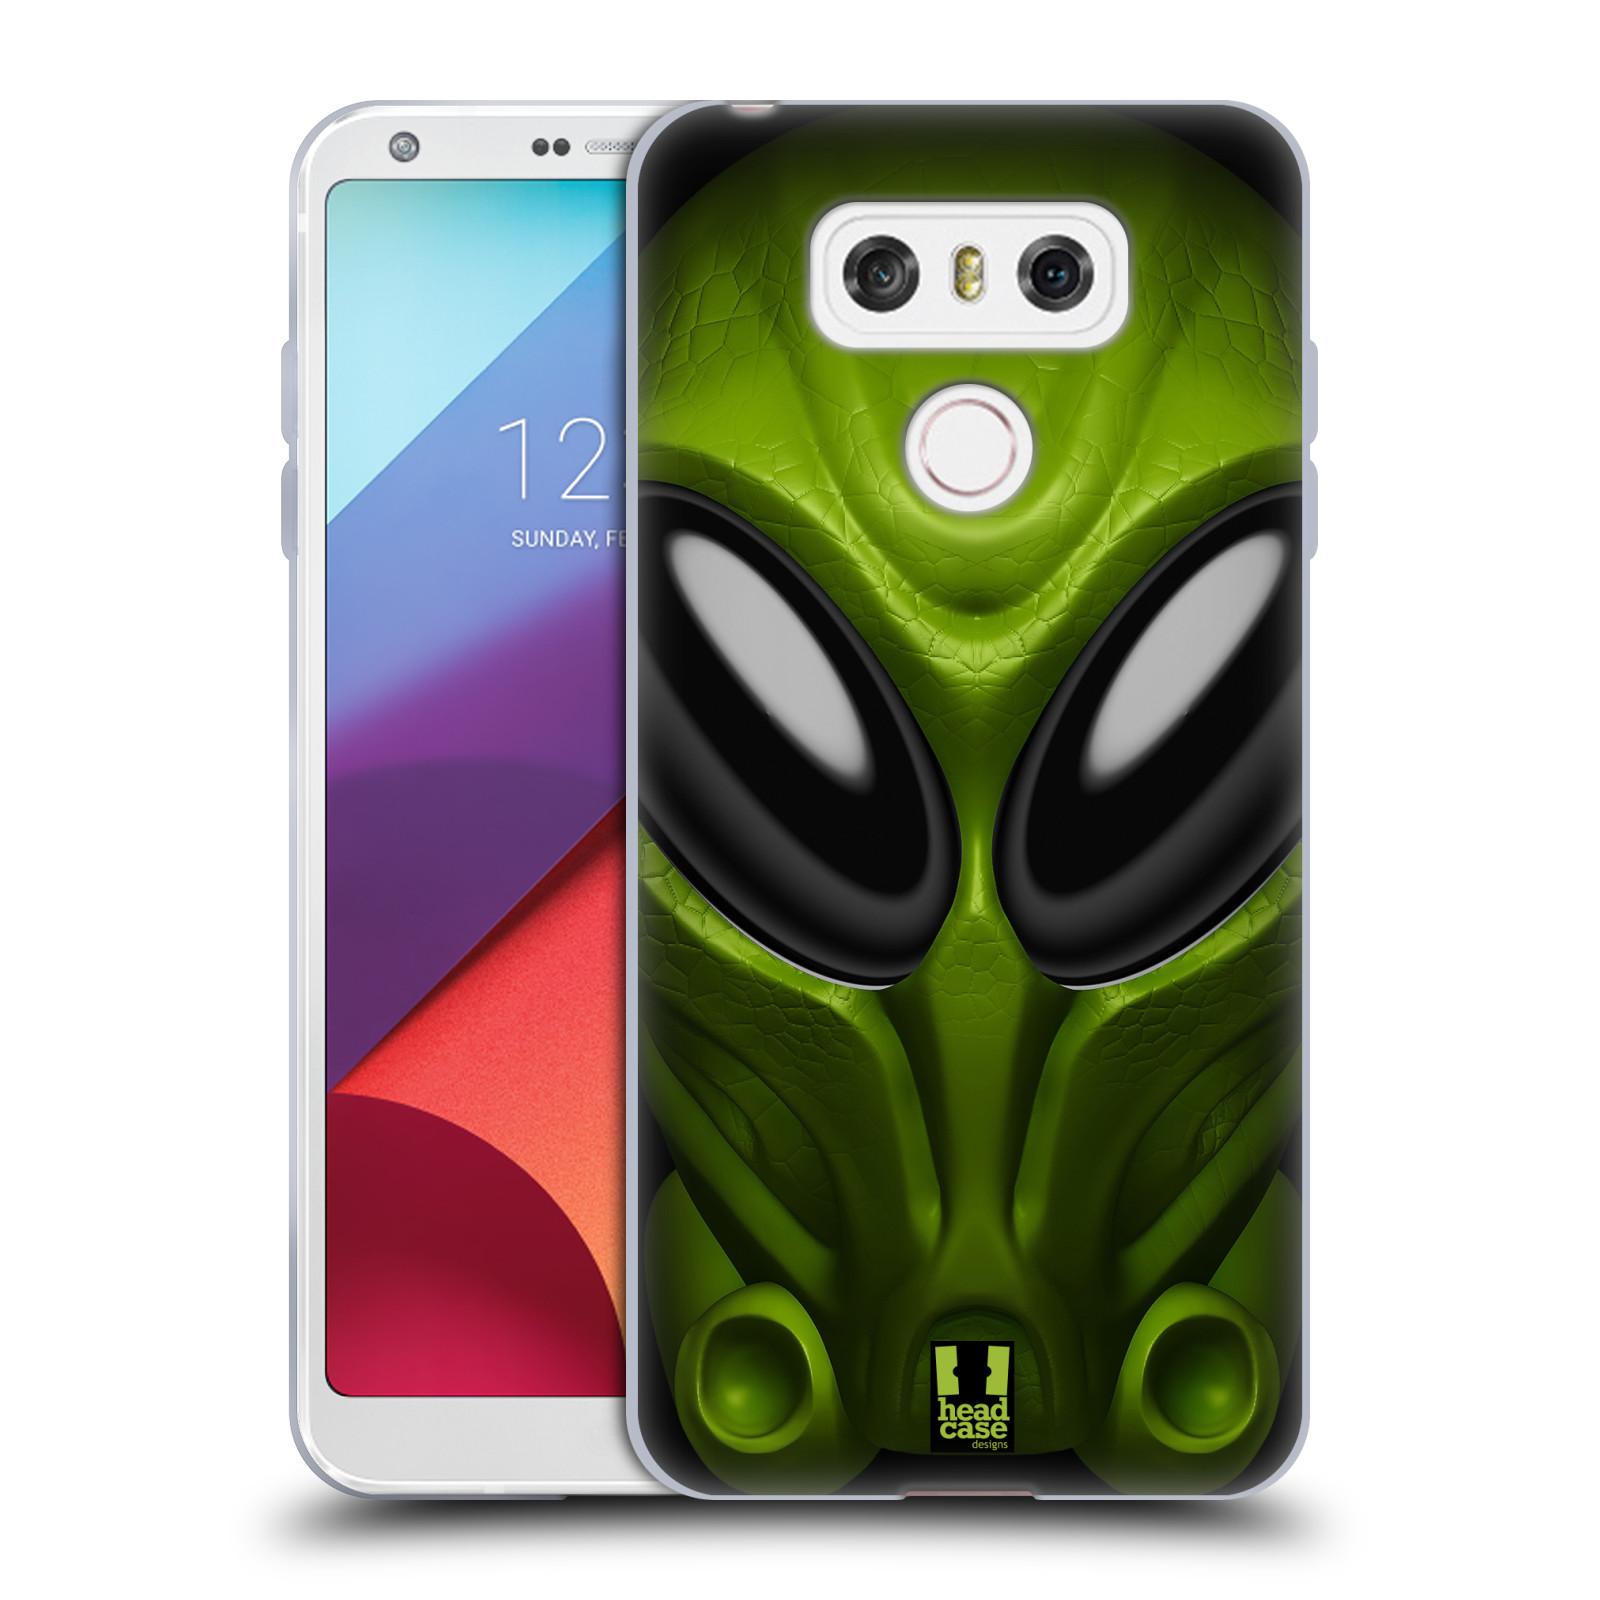 Silikonové pouzdro na mobil LG G6 - Head Case - Ufoun Mastermind